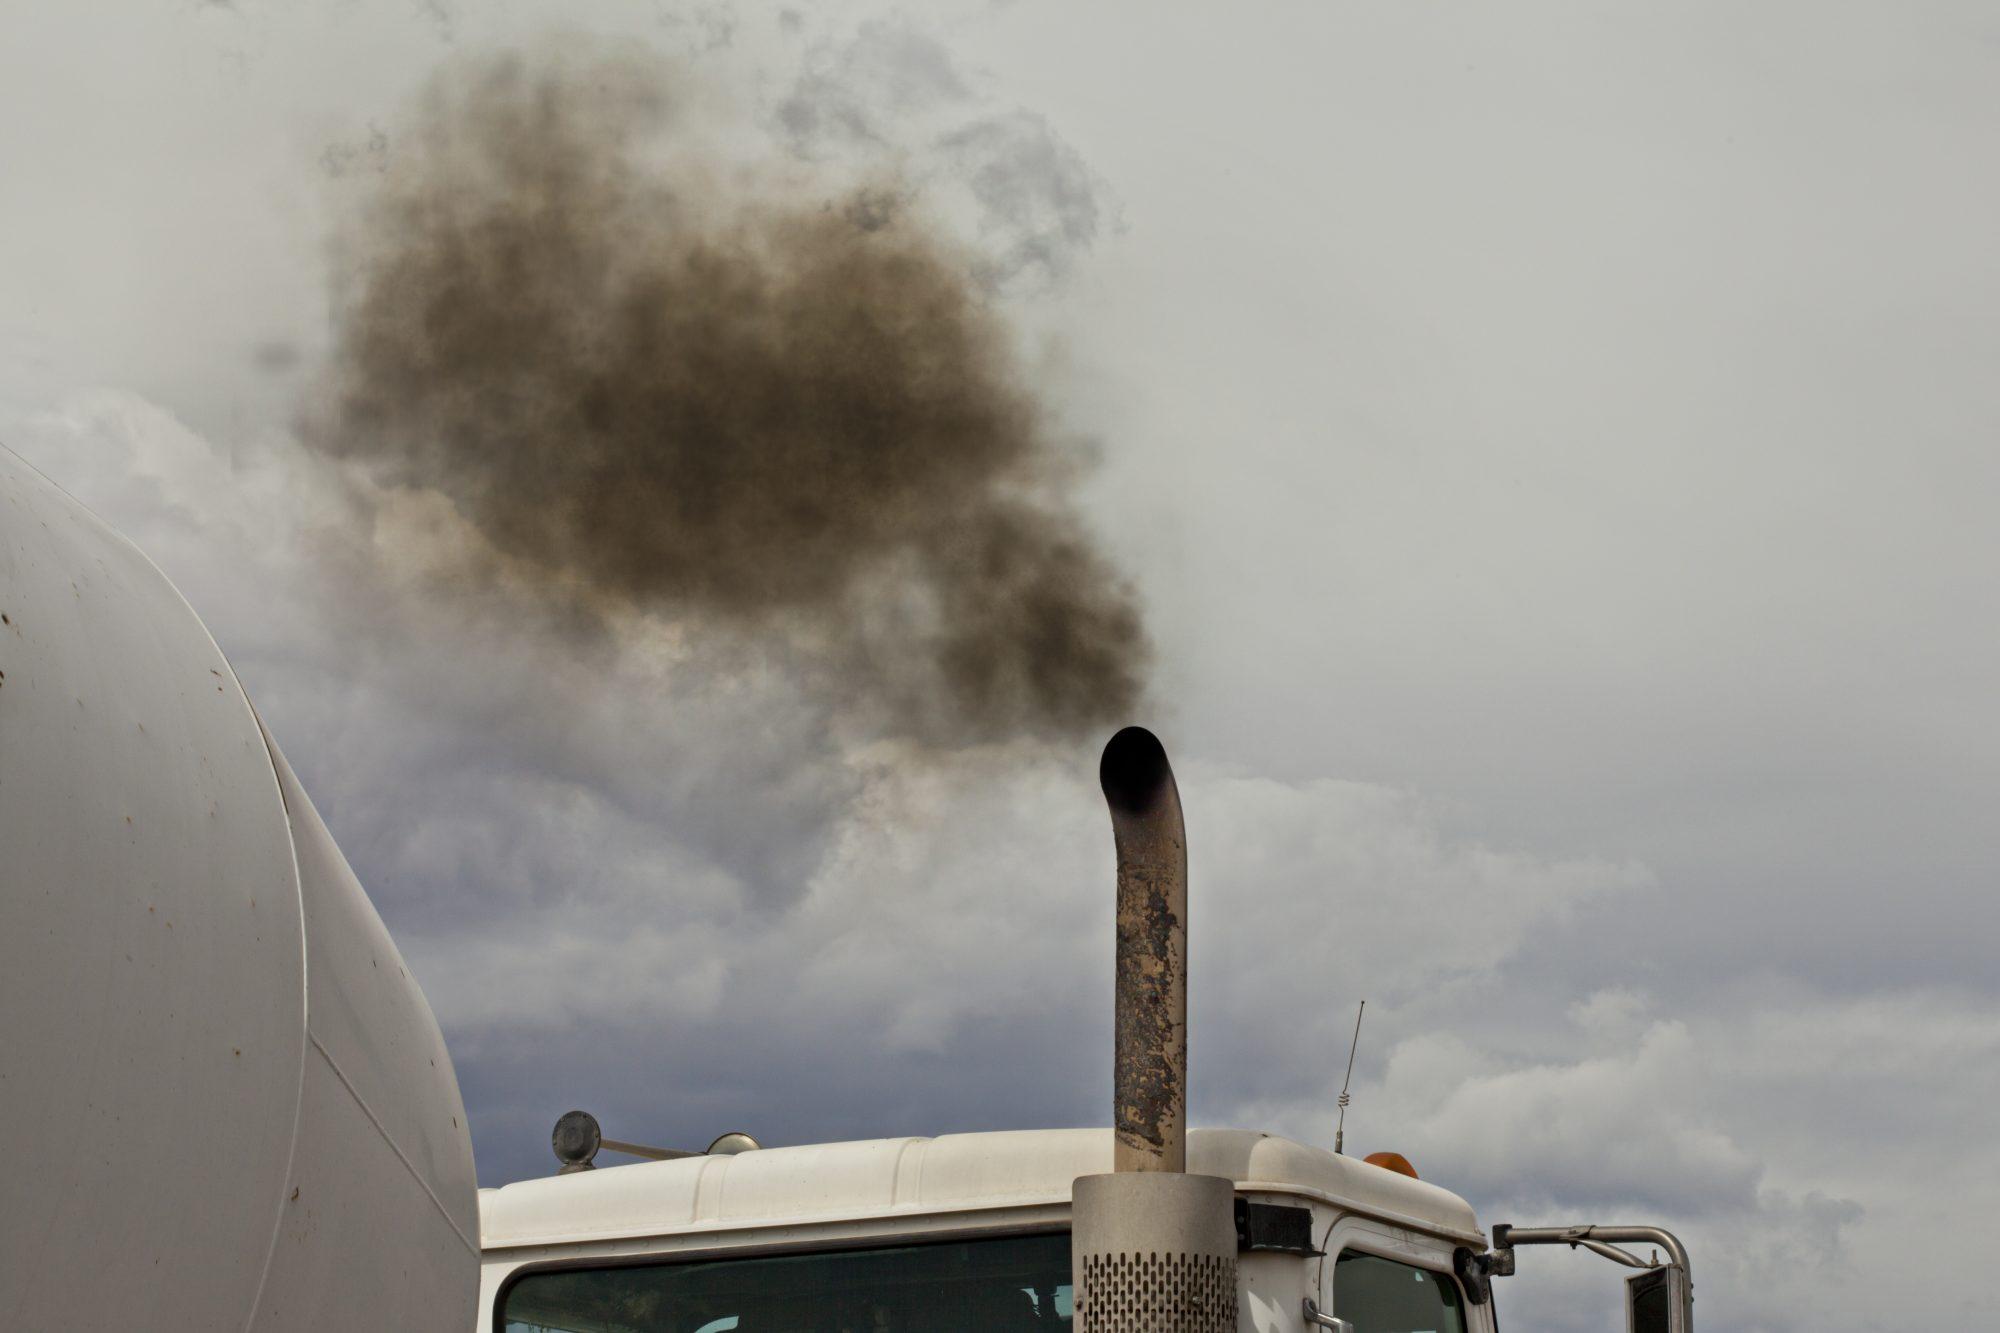 A white dump truck spews black exhaust smoke into a blue sky.